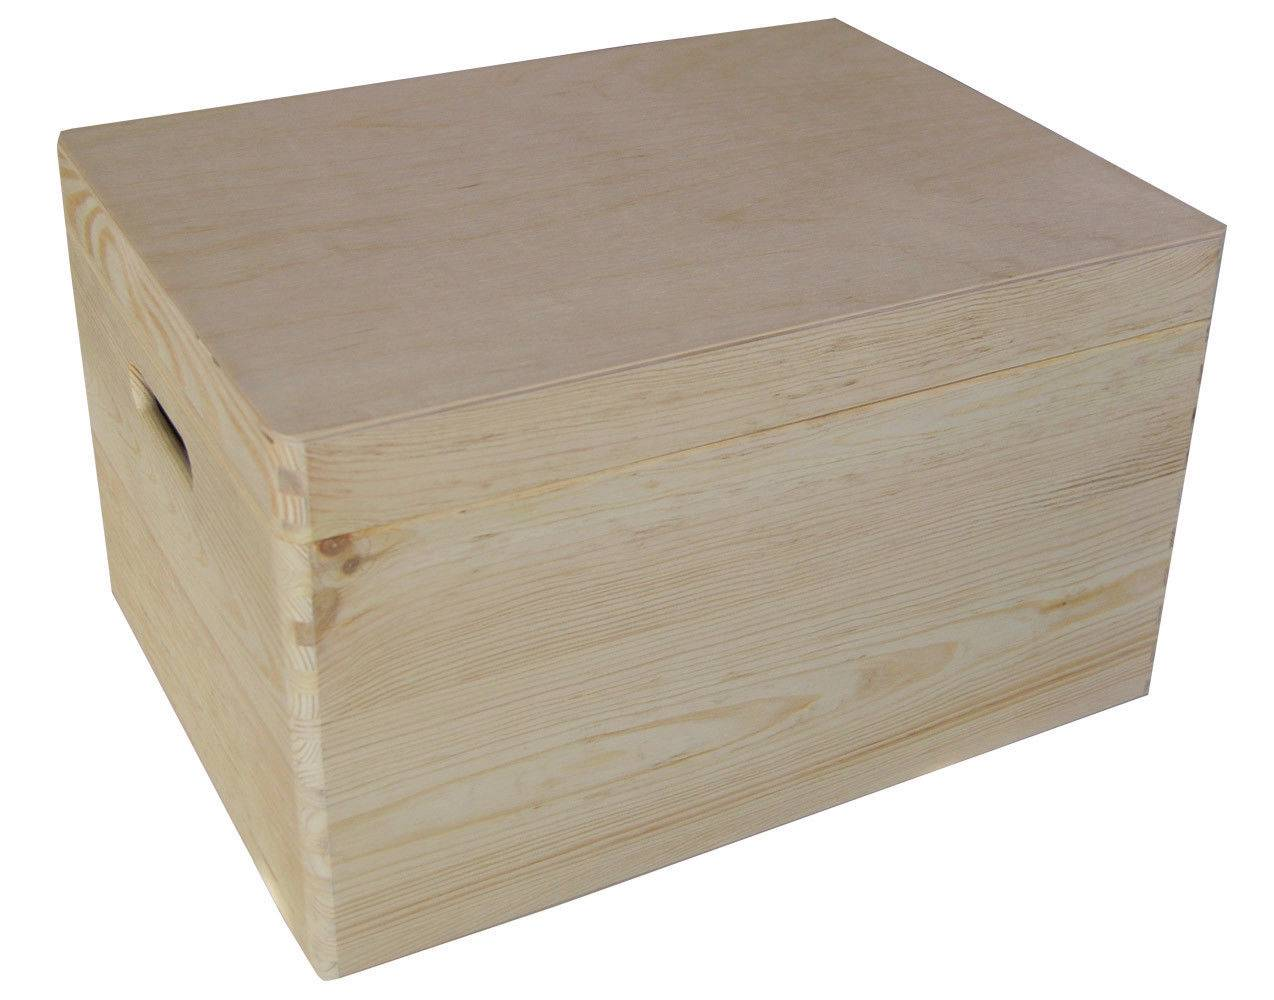 SK-PK-PLAIN-WOOD-KEEPSAKE-SOUVENIRS-MEMORY-BOX-CRAFT-WITH-THE-LID-DECOUPAGE